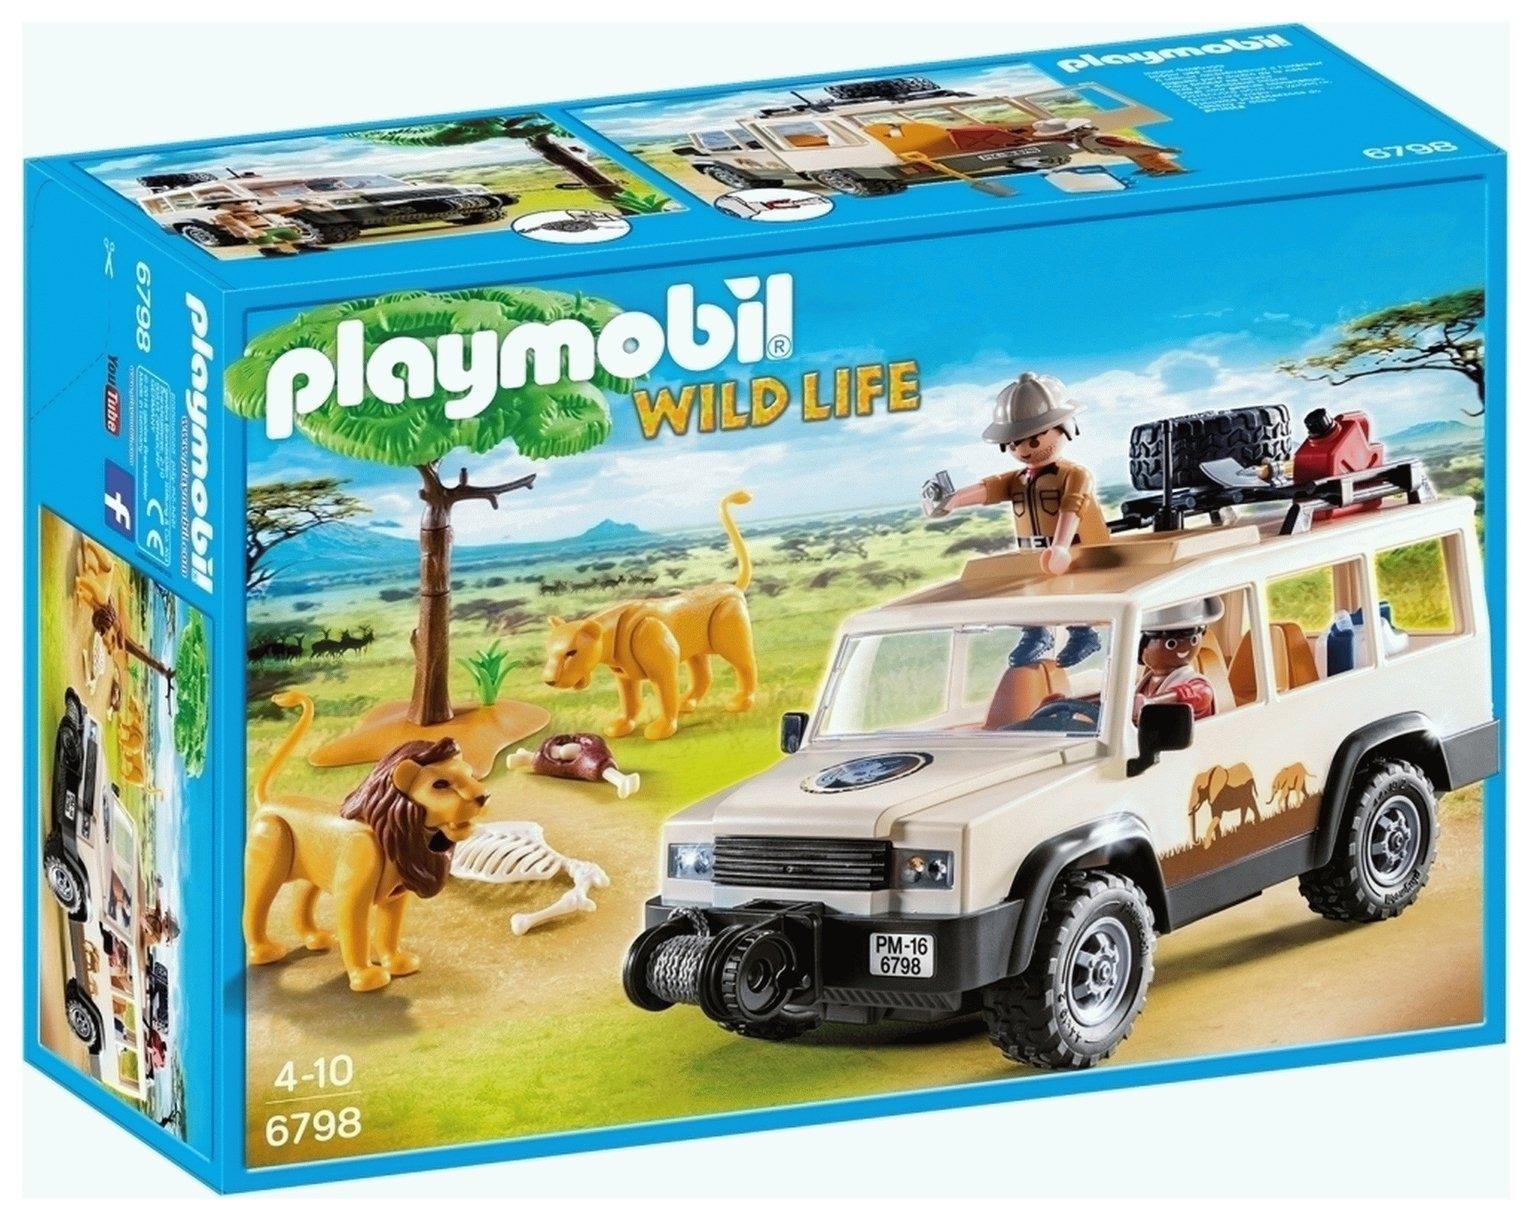 Playmobil 6798 Wild Life Safari Truck